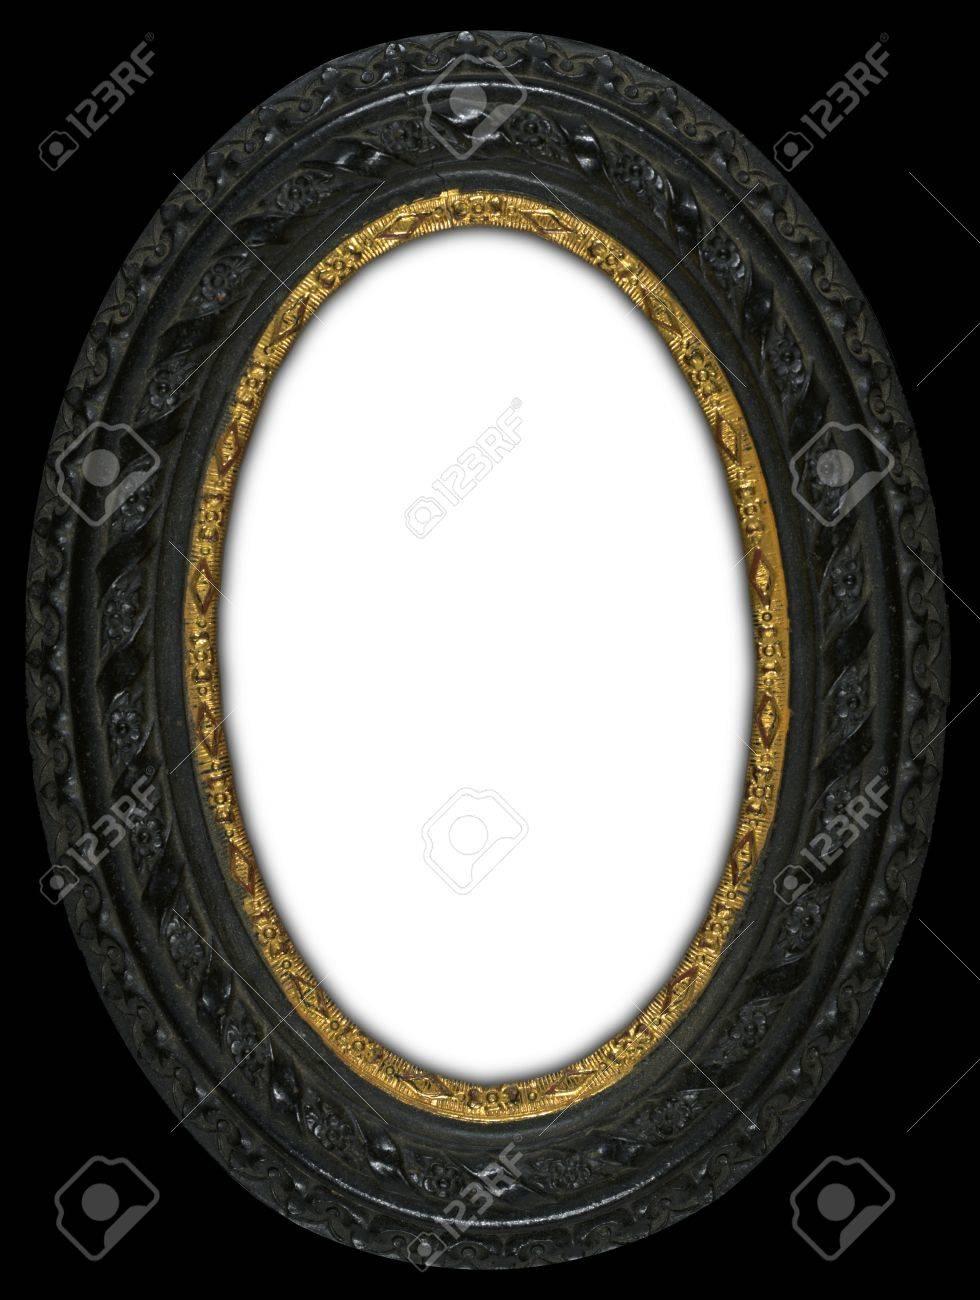 Tallado Antiguo Marco Oval Con Un Inserto De Anillo De Oro Alrededor ...